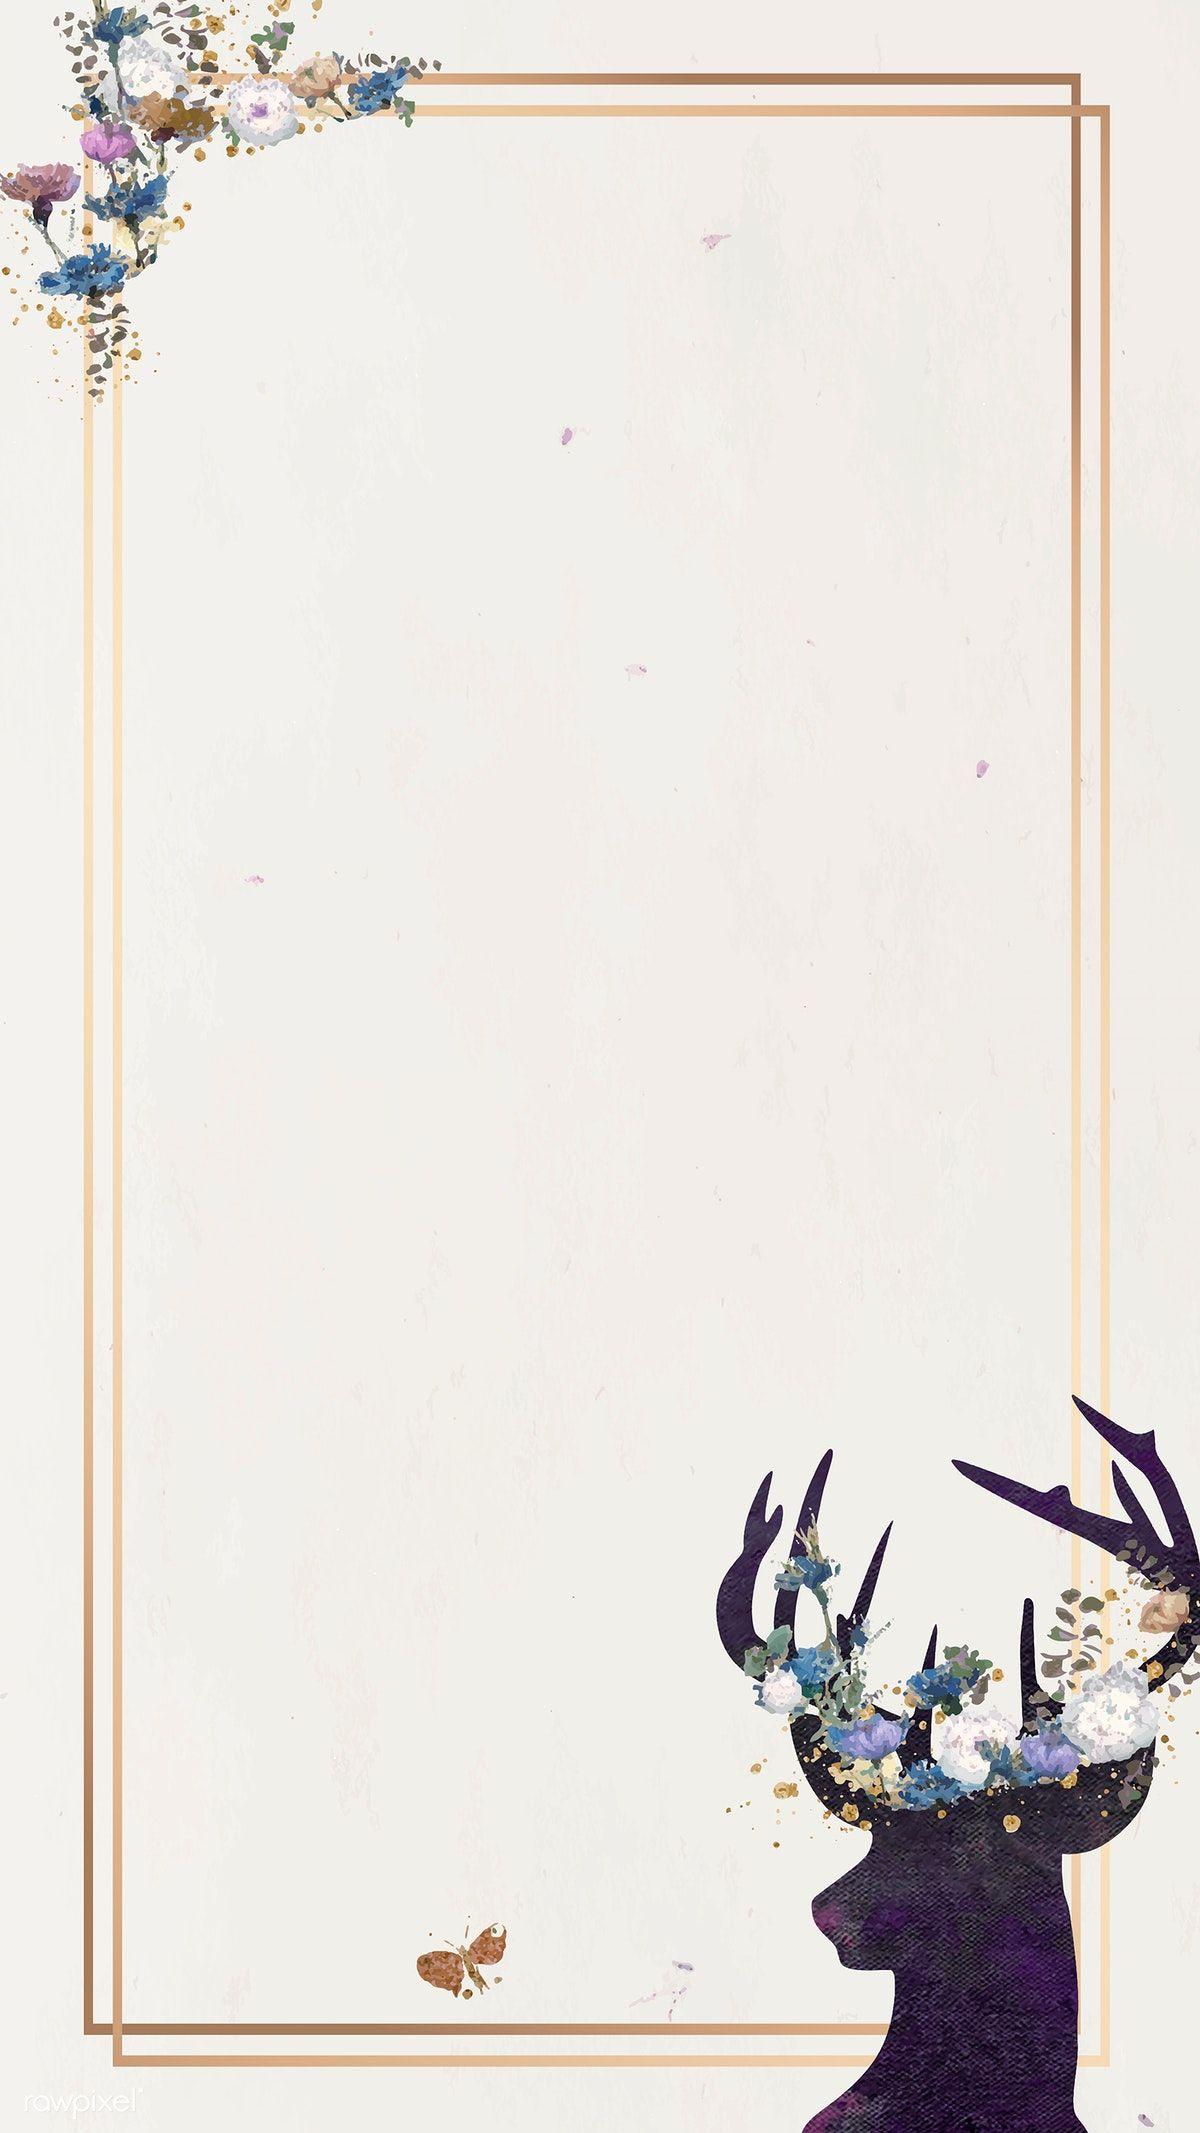 Download Premium Vector Of Deer Head Silhouette Painting Mobile Phone Watercolor Pattern Background Silhouette Painting Flower Background Wallpaper